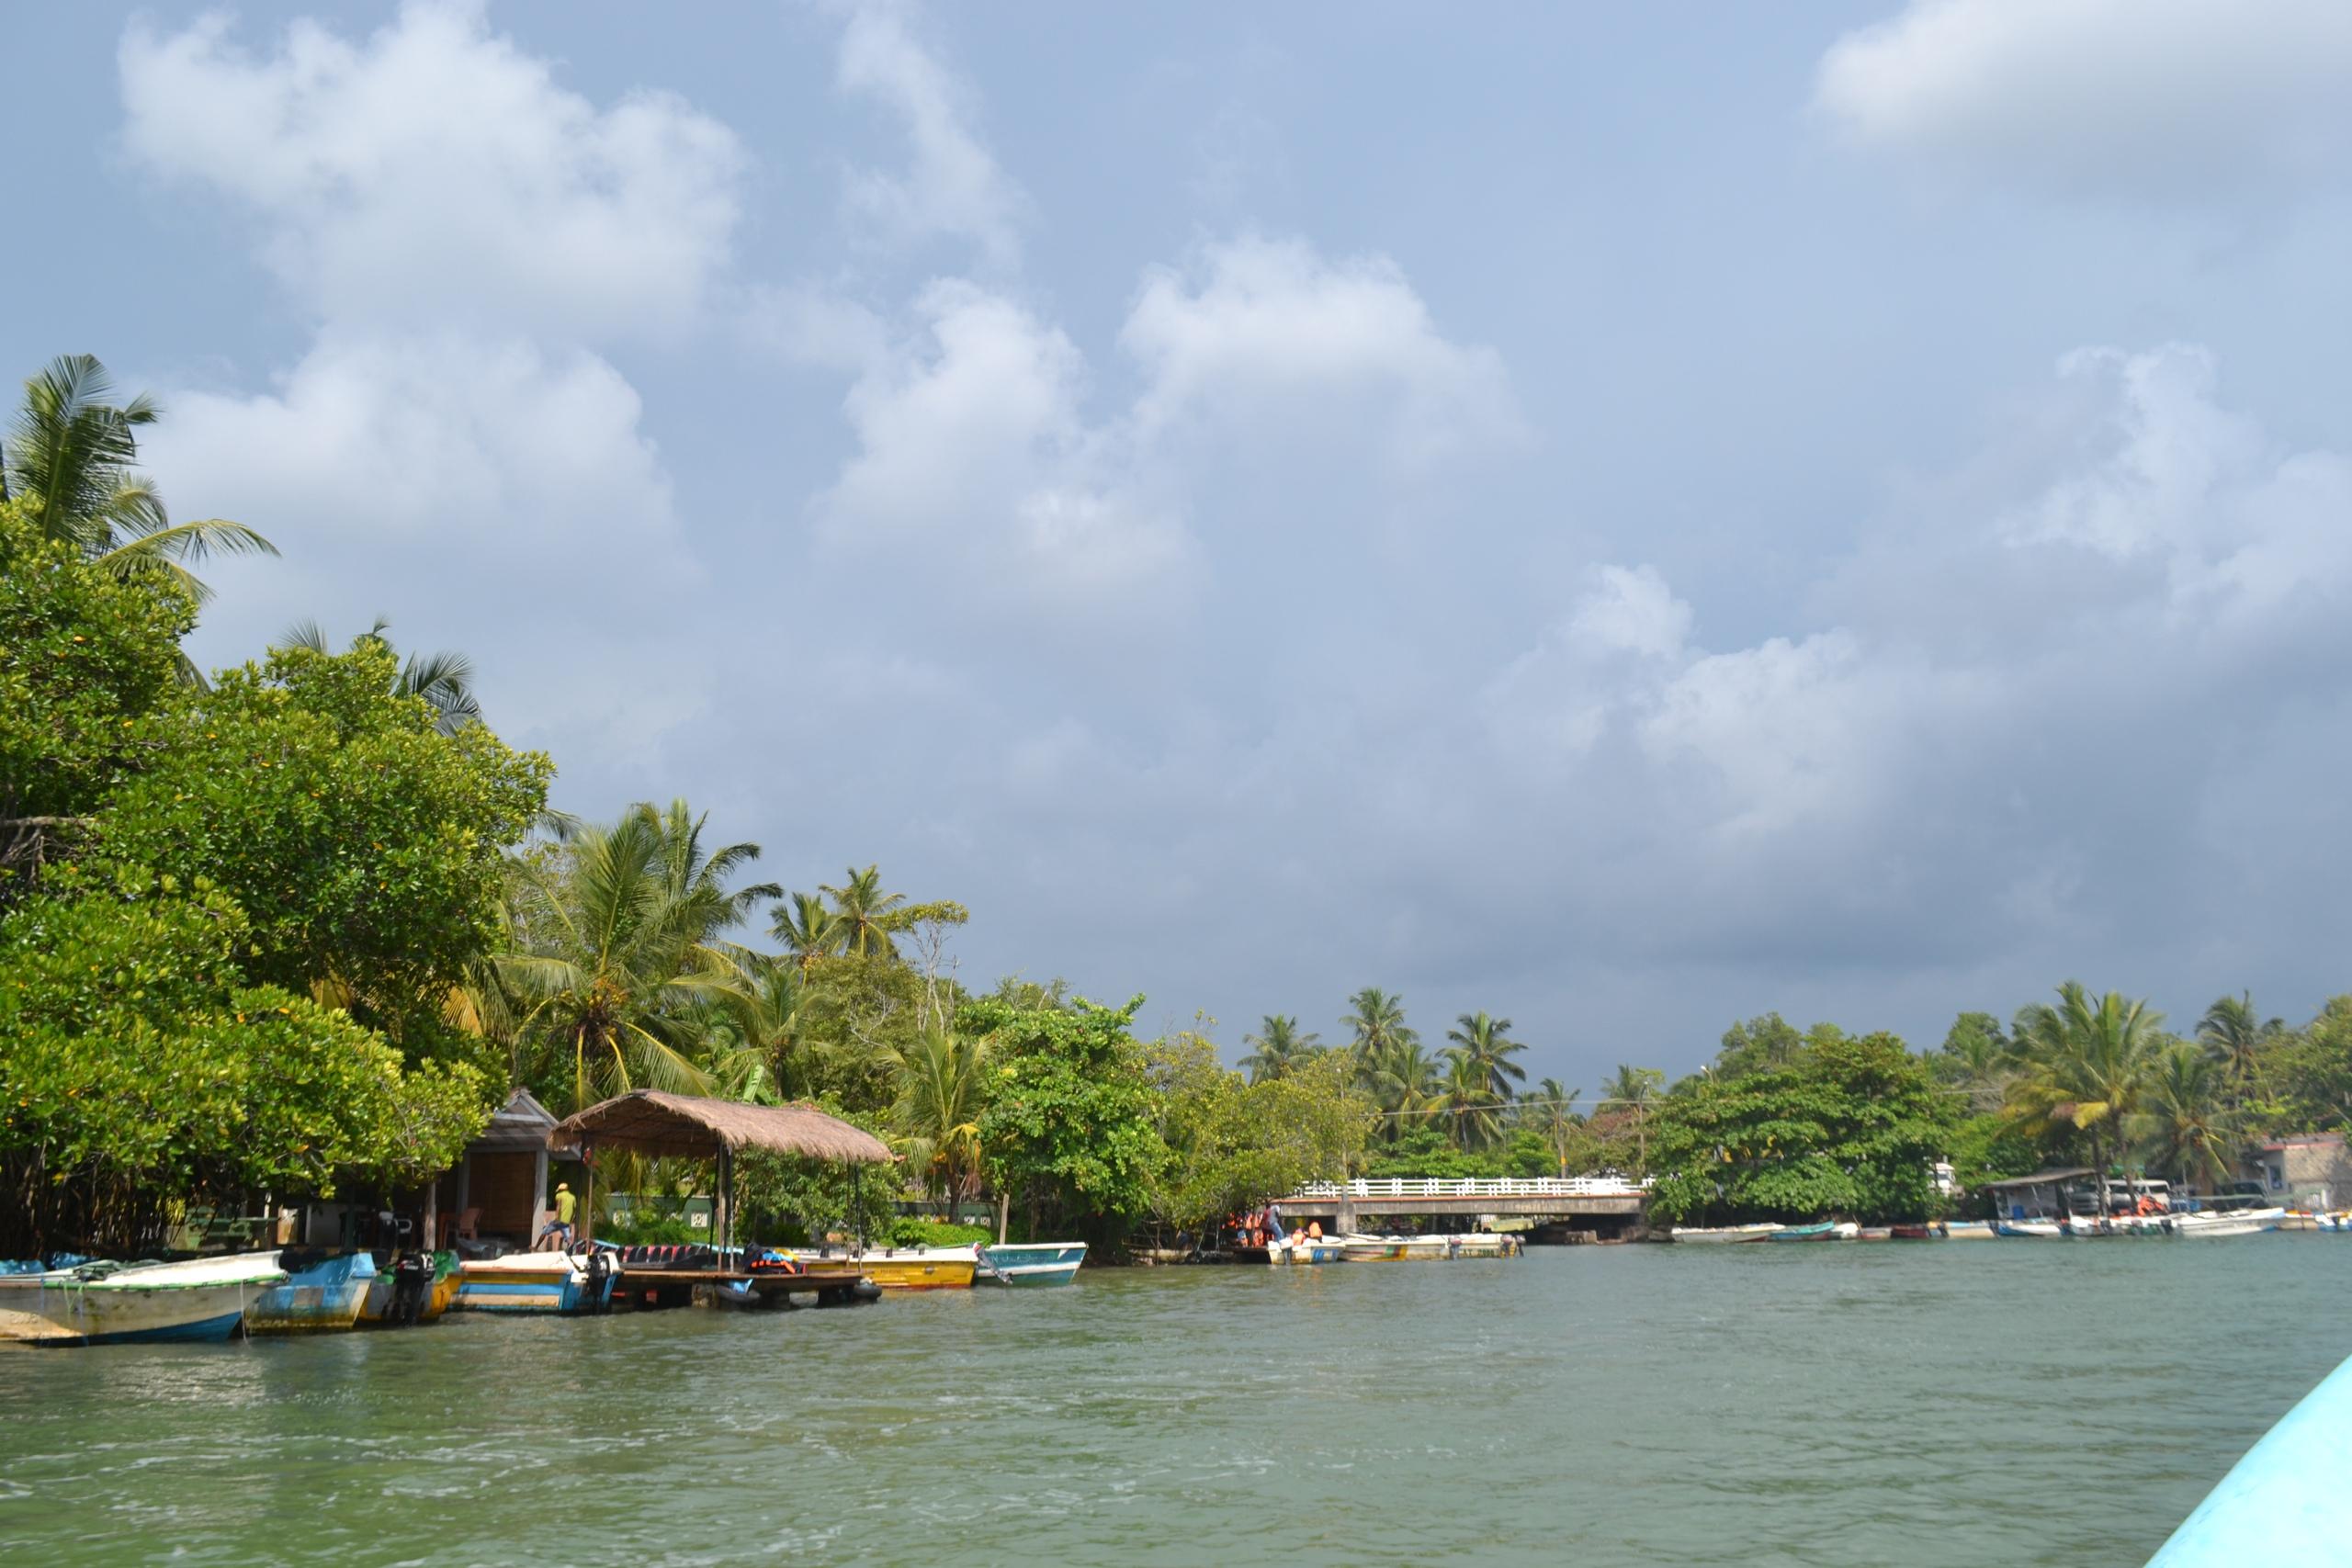 Шри Ланка (фото) - Страница 9 CnSREotapdw